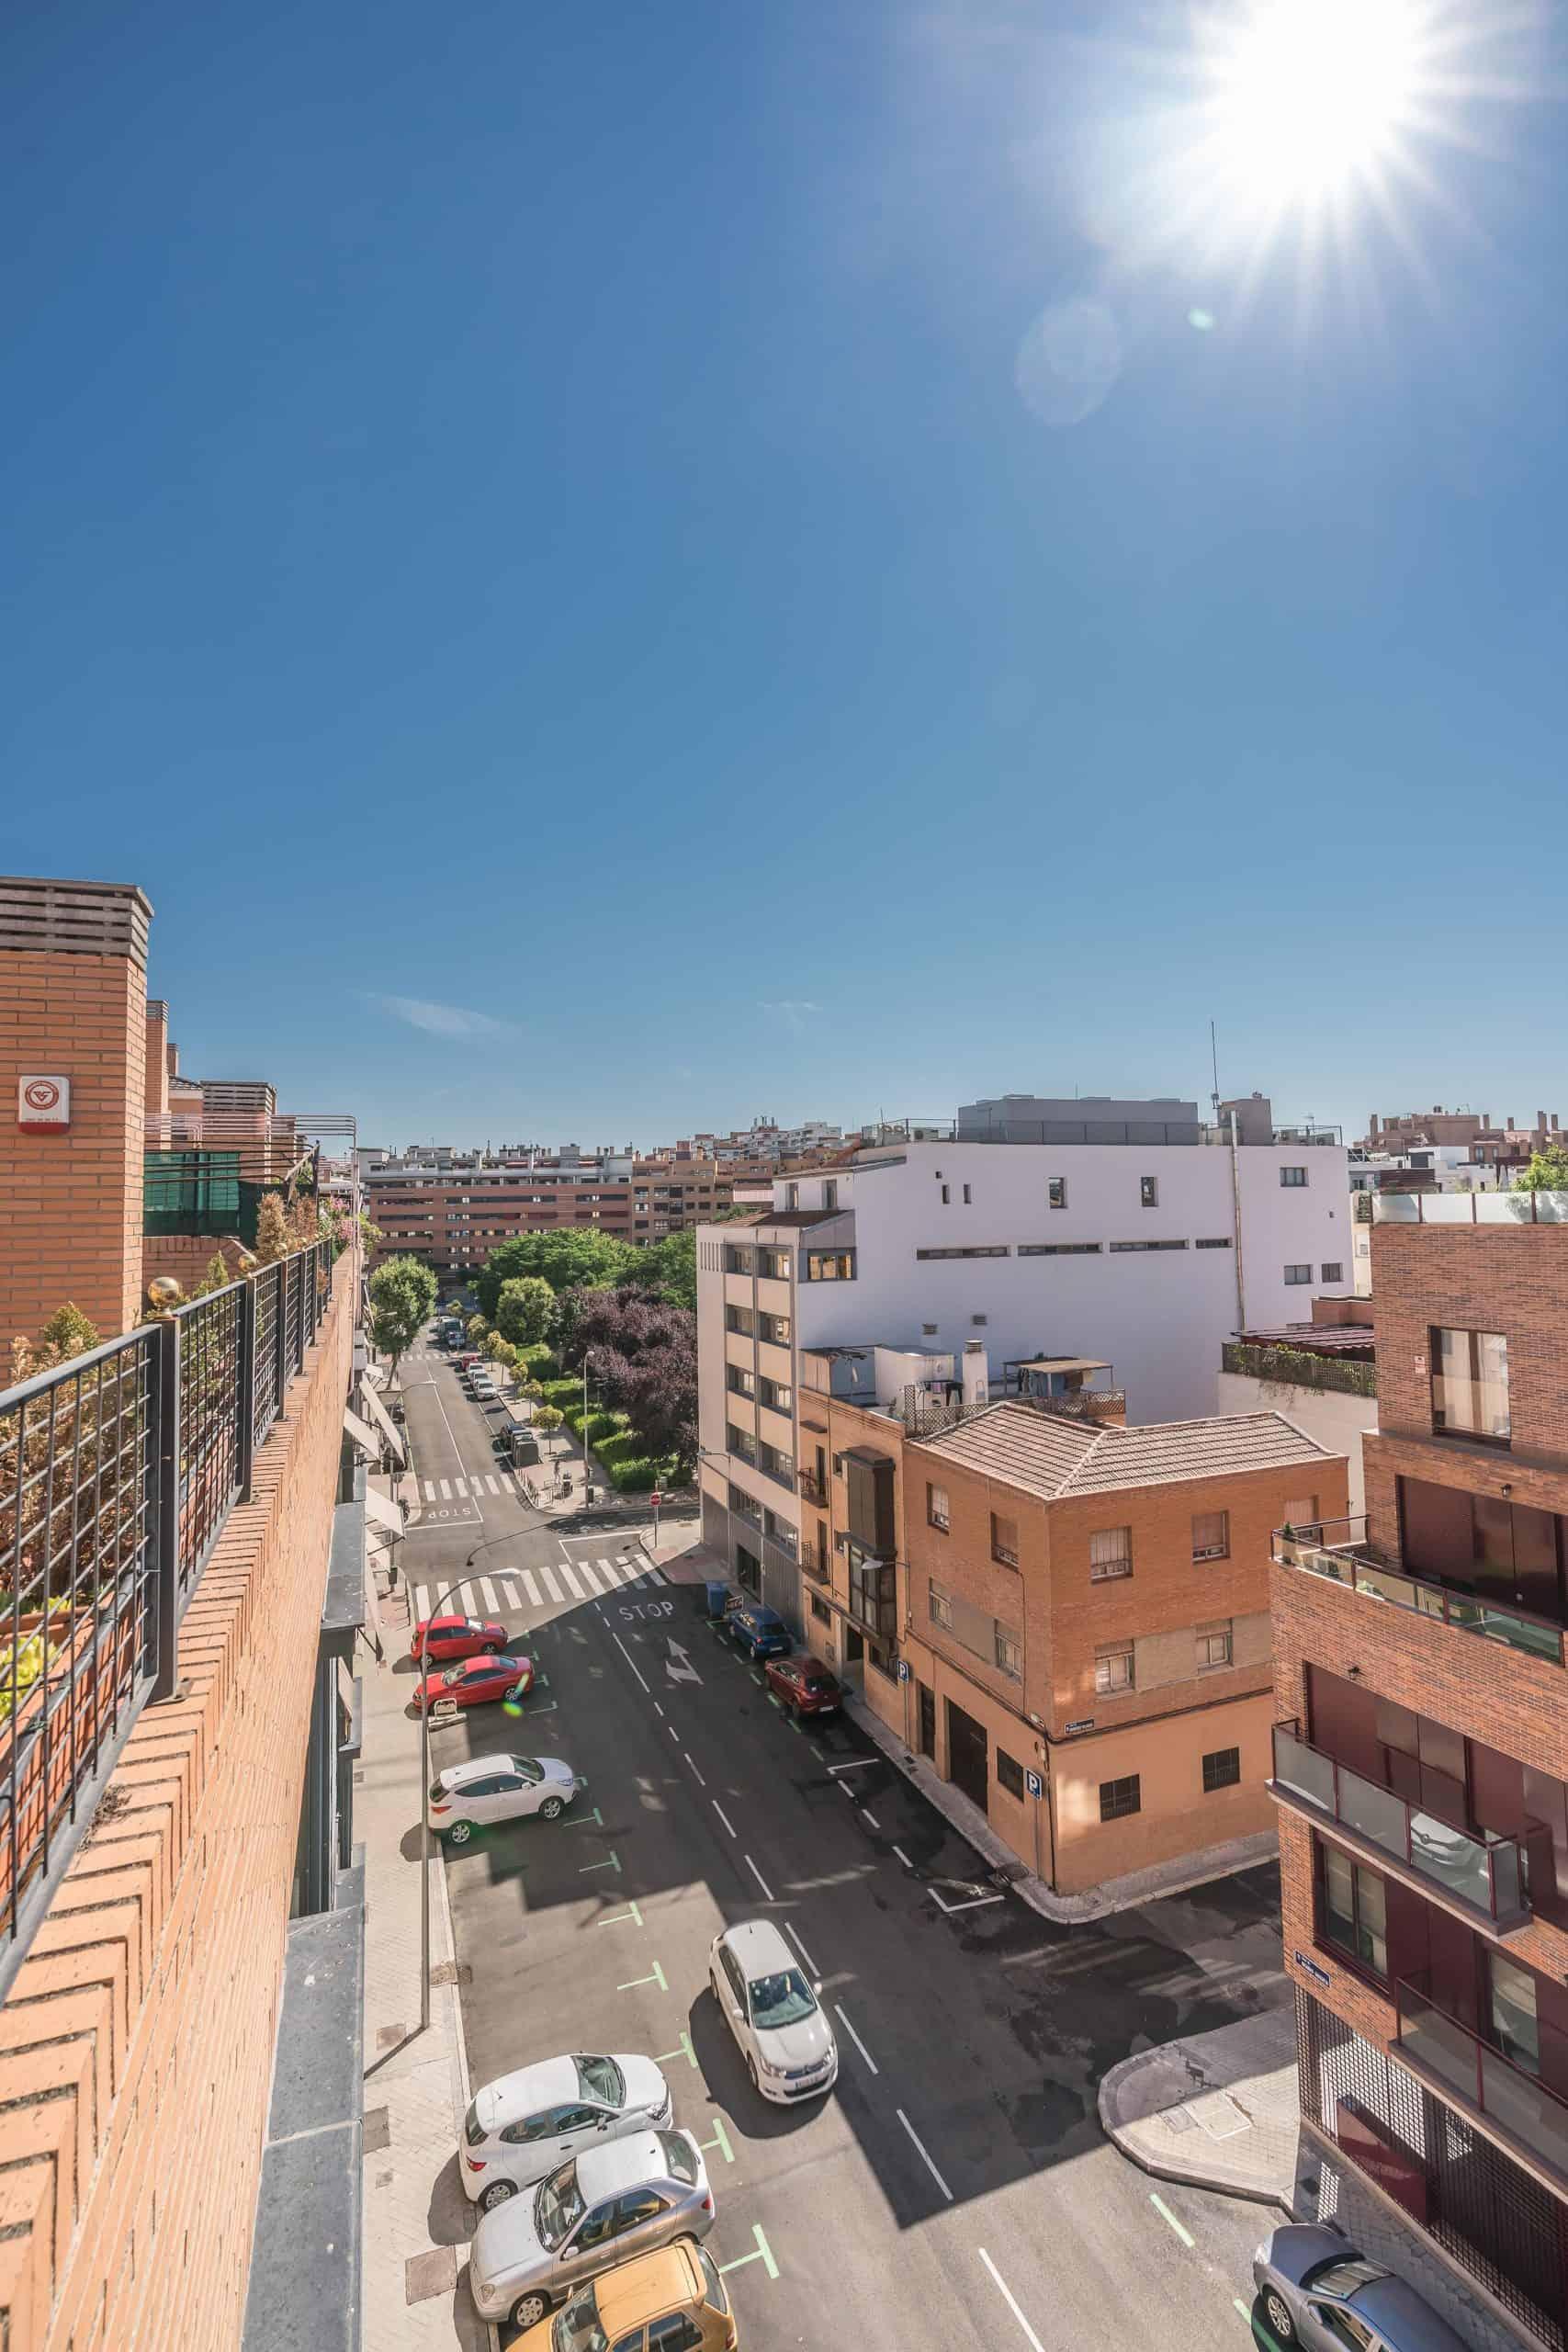 Agencia Inmobiliaria de Madrid-FUTUROCASA-Zona ARGANZUELA-EMBAJADORES-LEGAZPI13 VISTAS (2)